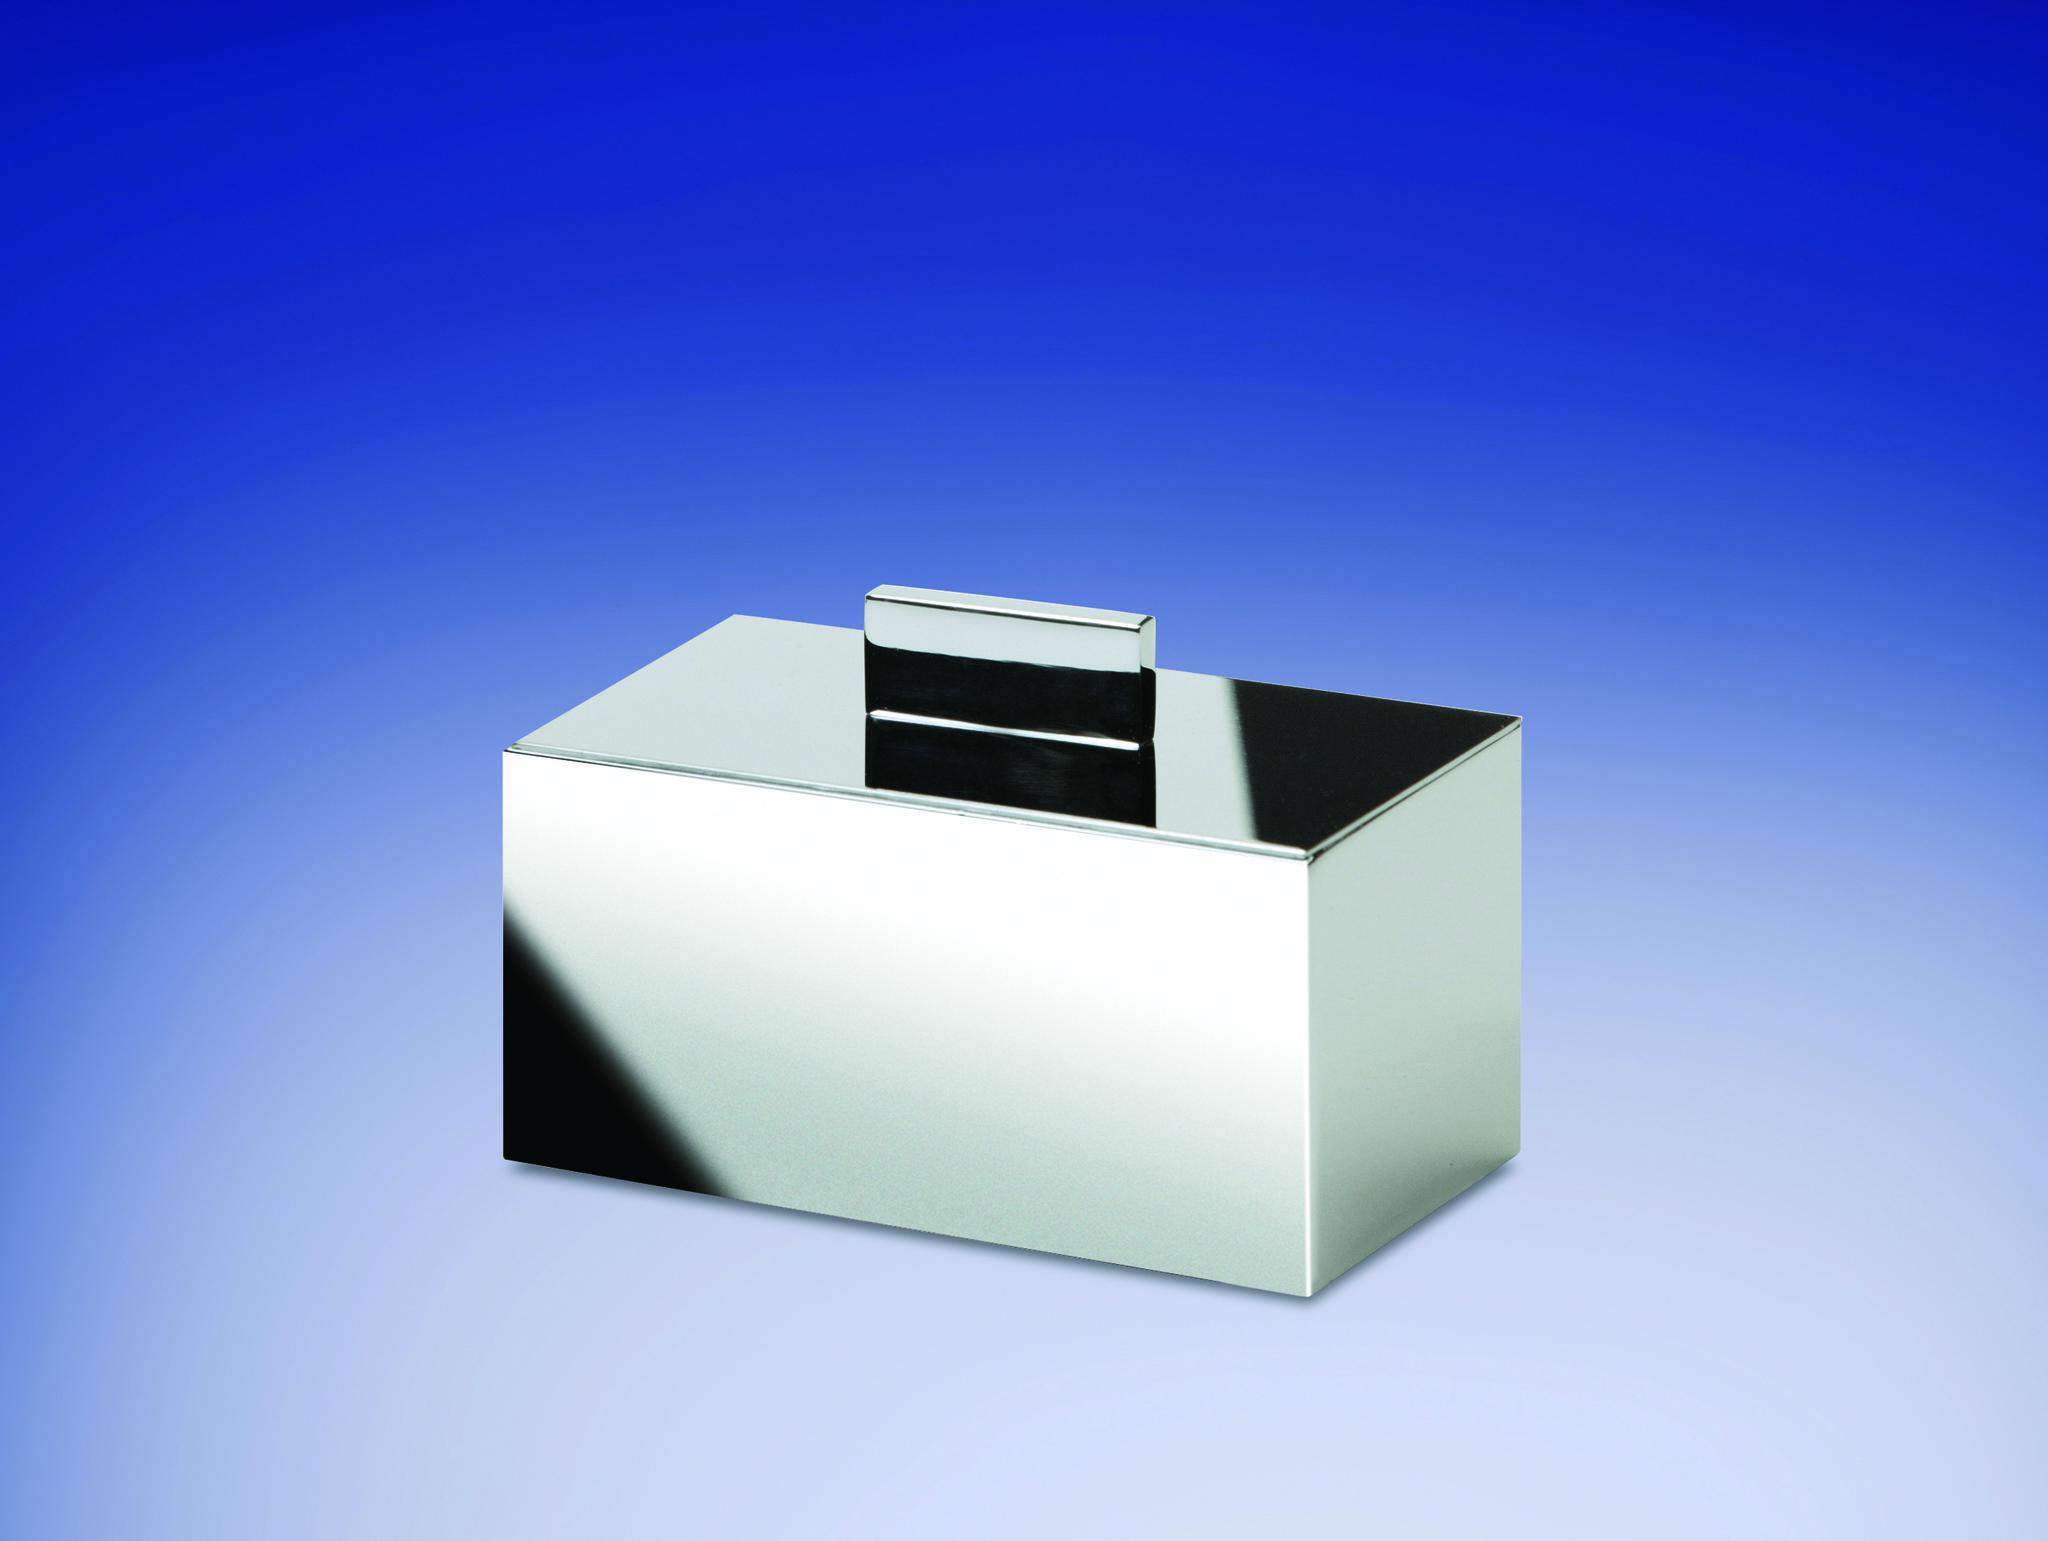 Для косметики Емкость для косметики малая Windisch 88417CR Metal Lineal banochka-malaya-88417-metal-lineal-ot-windisch-ispaniya.jpg